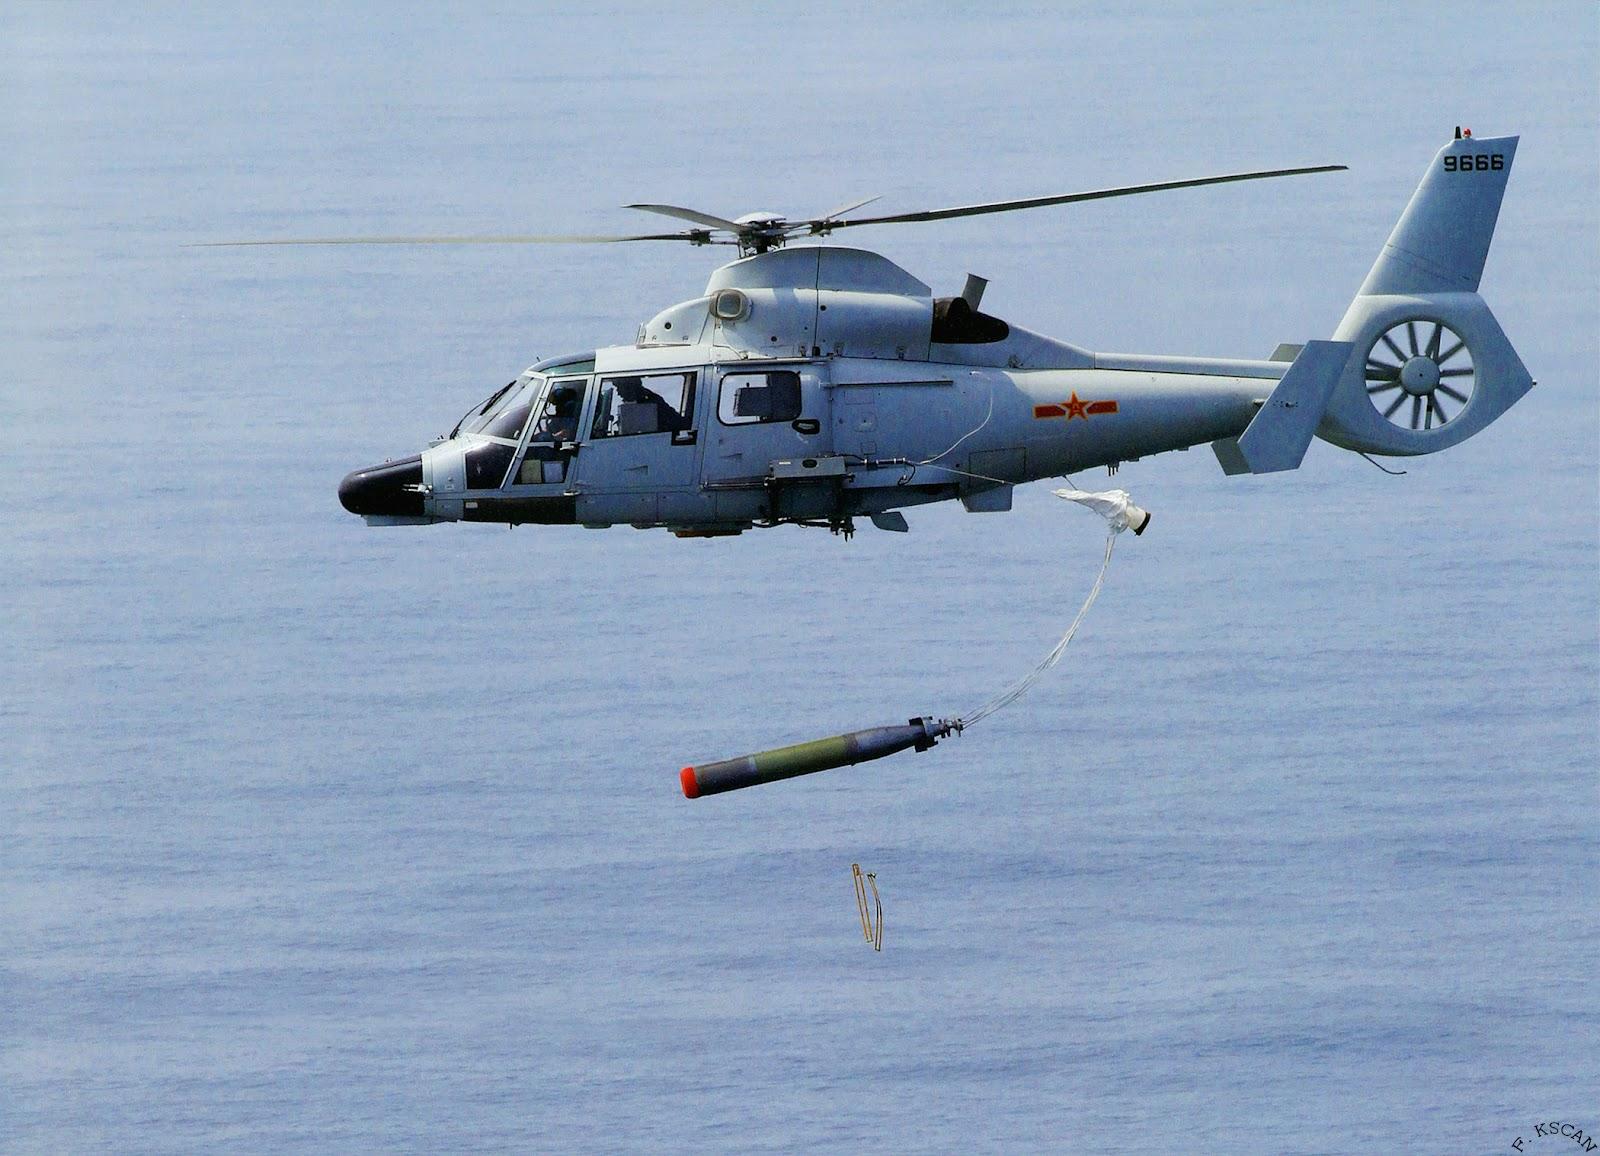 Argentina compra 4 remolcadores rusos - Página 4 Harbin+helicopter.+Z-9EC+ASW+Naval+Air+Arm+pulse-compression+radar%252C+low+frequency+dipping+sonar%252C+radar+warning+receiver+and+doppler+navigation+system%252C+torpedoes+frigates+%25282%2529